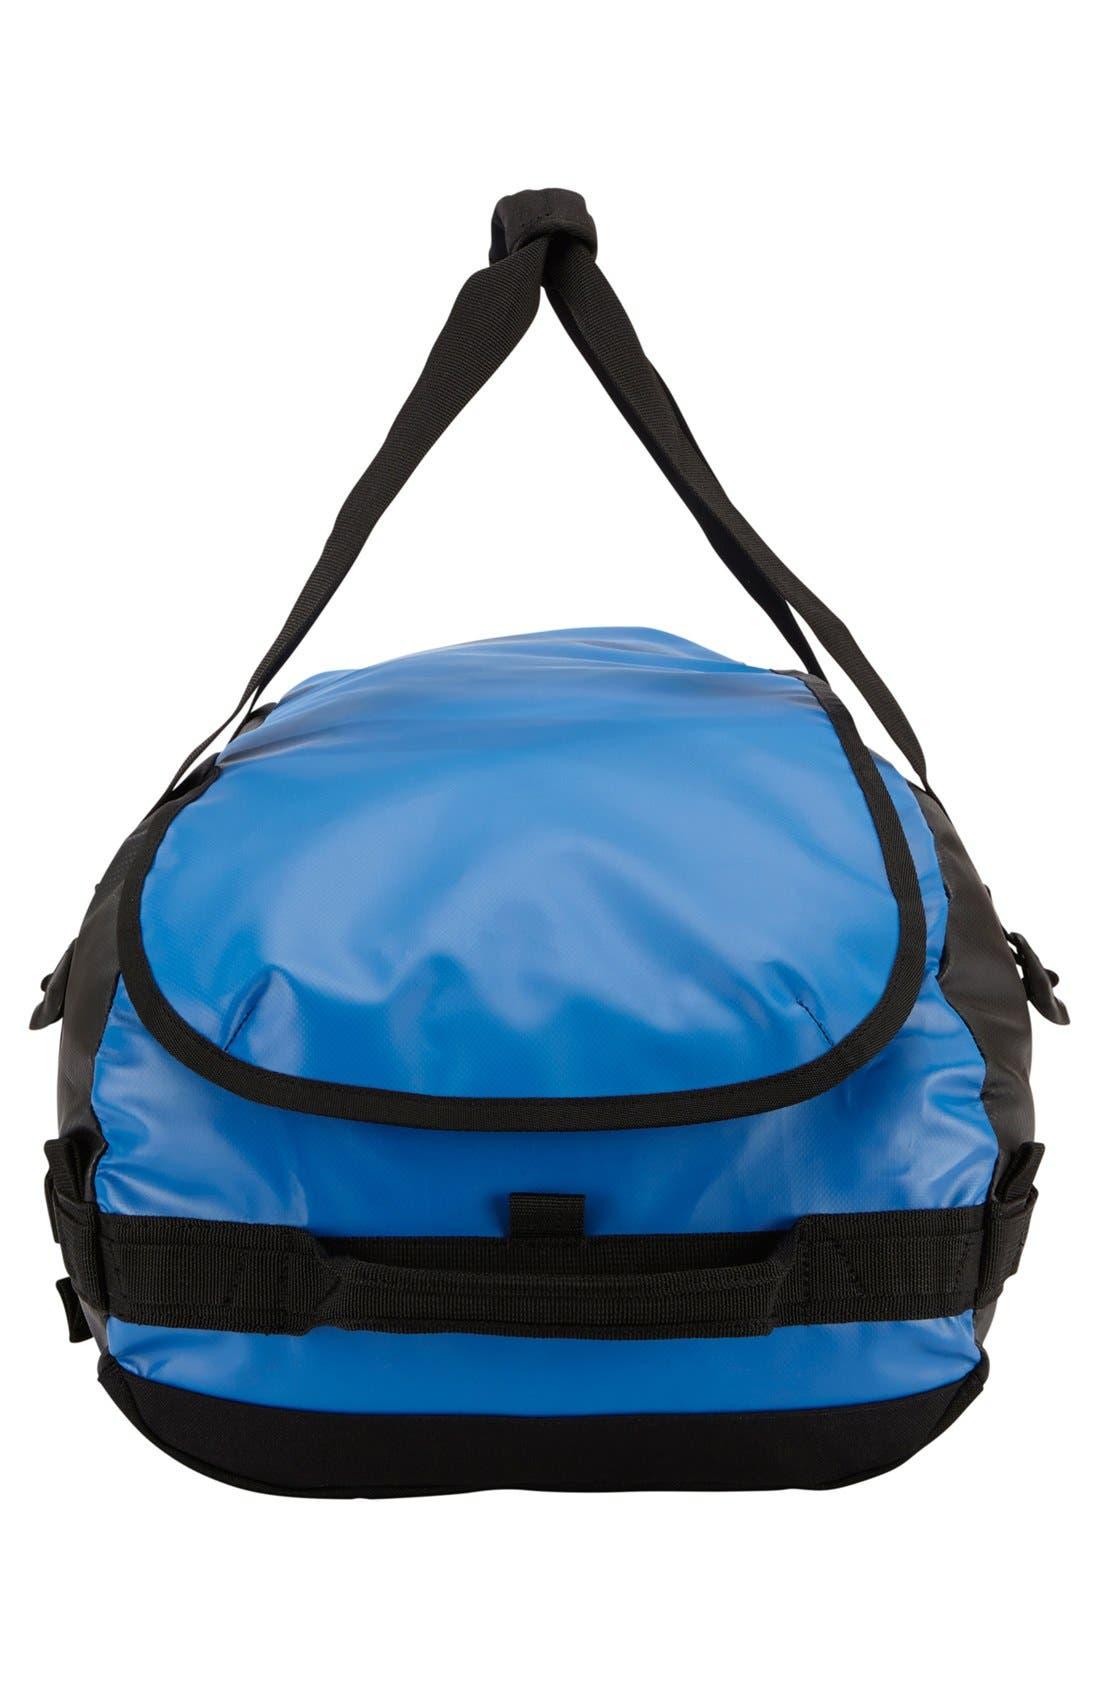 Alternate Image 3  - Thule Small Duffel Bag (40L Capacity)